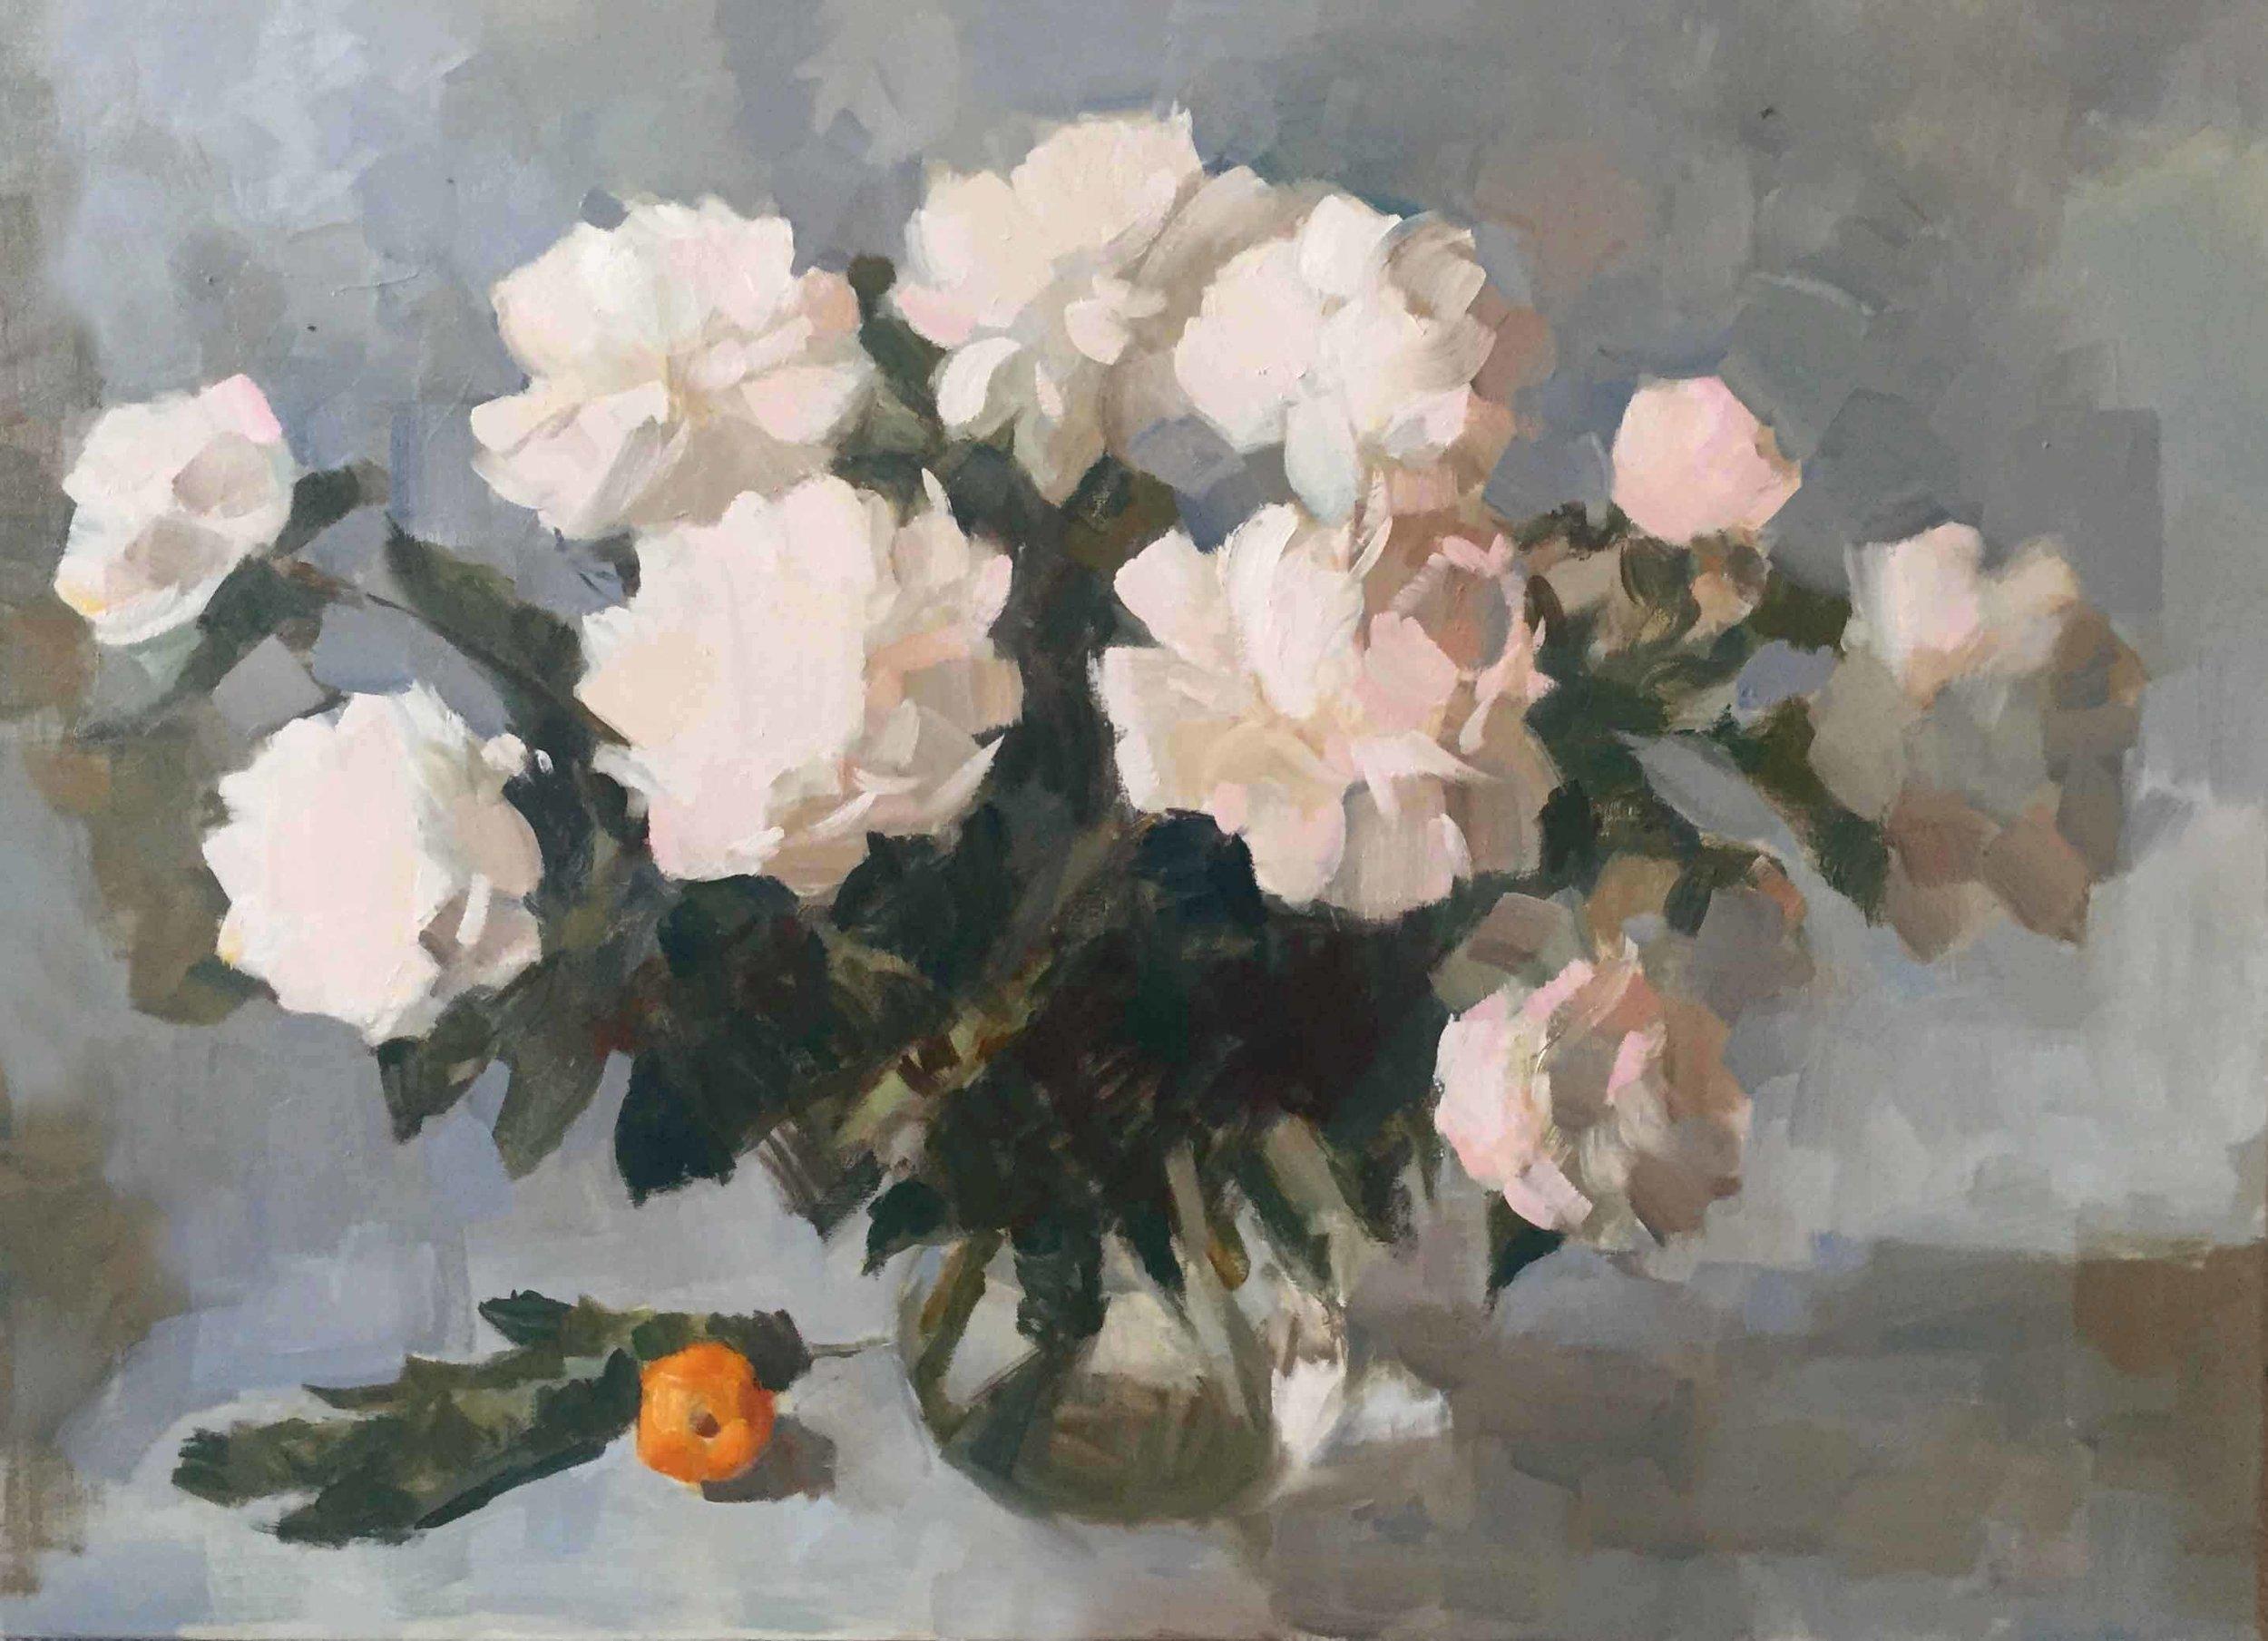 White Peonies.   Oil on Canvas   73 x 100 cm  2018